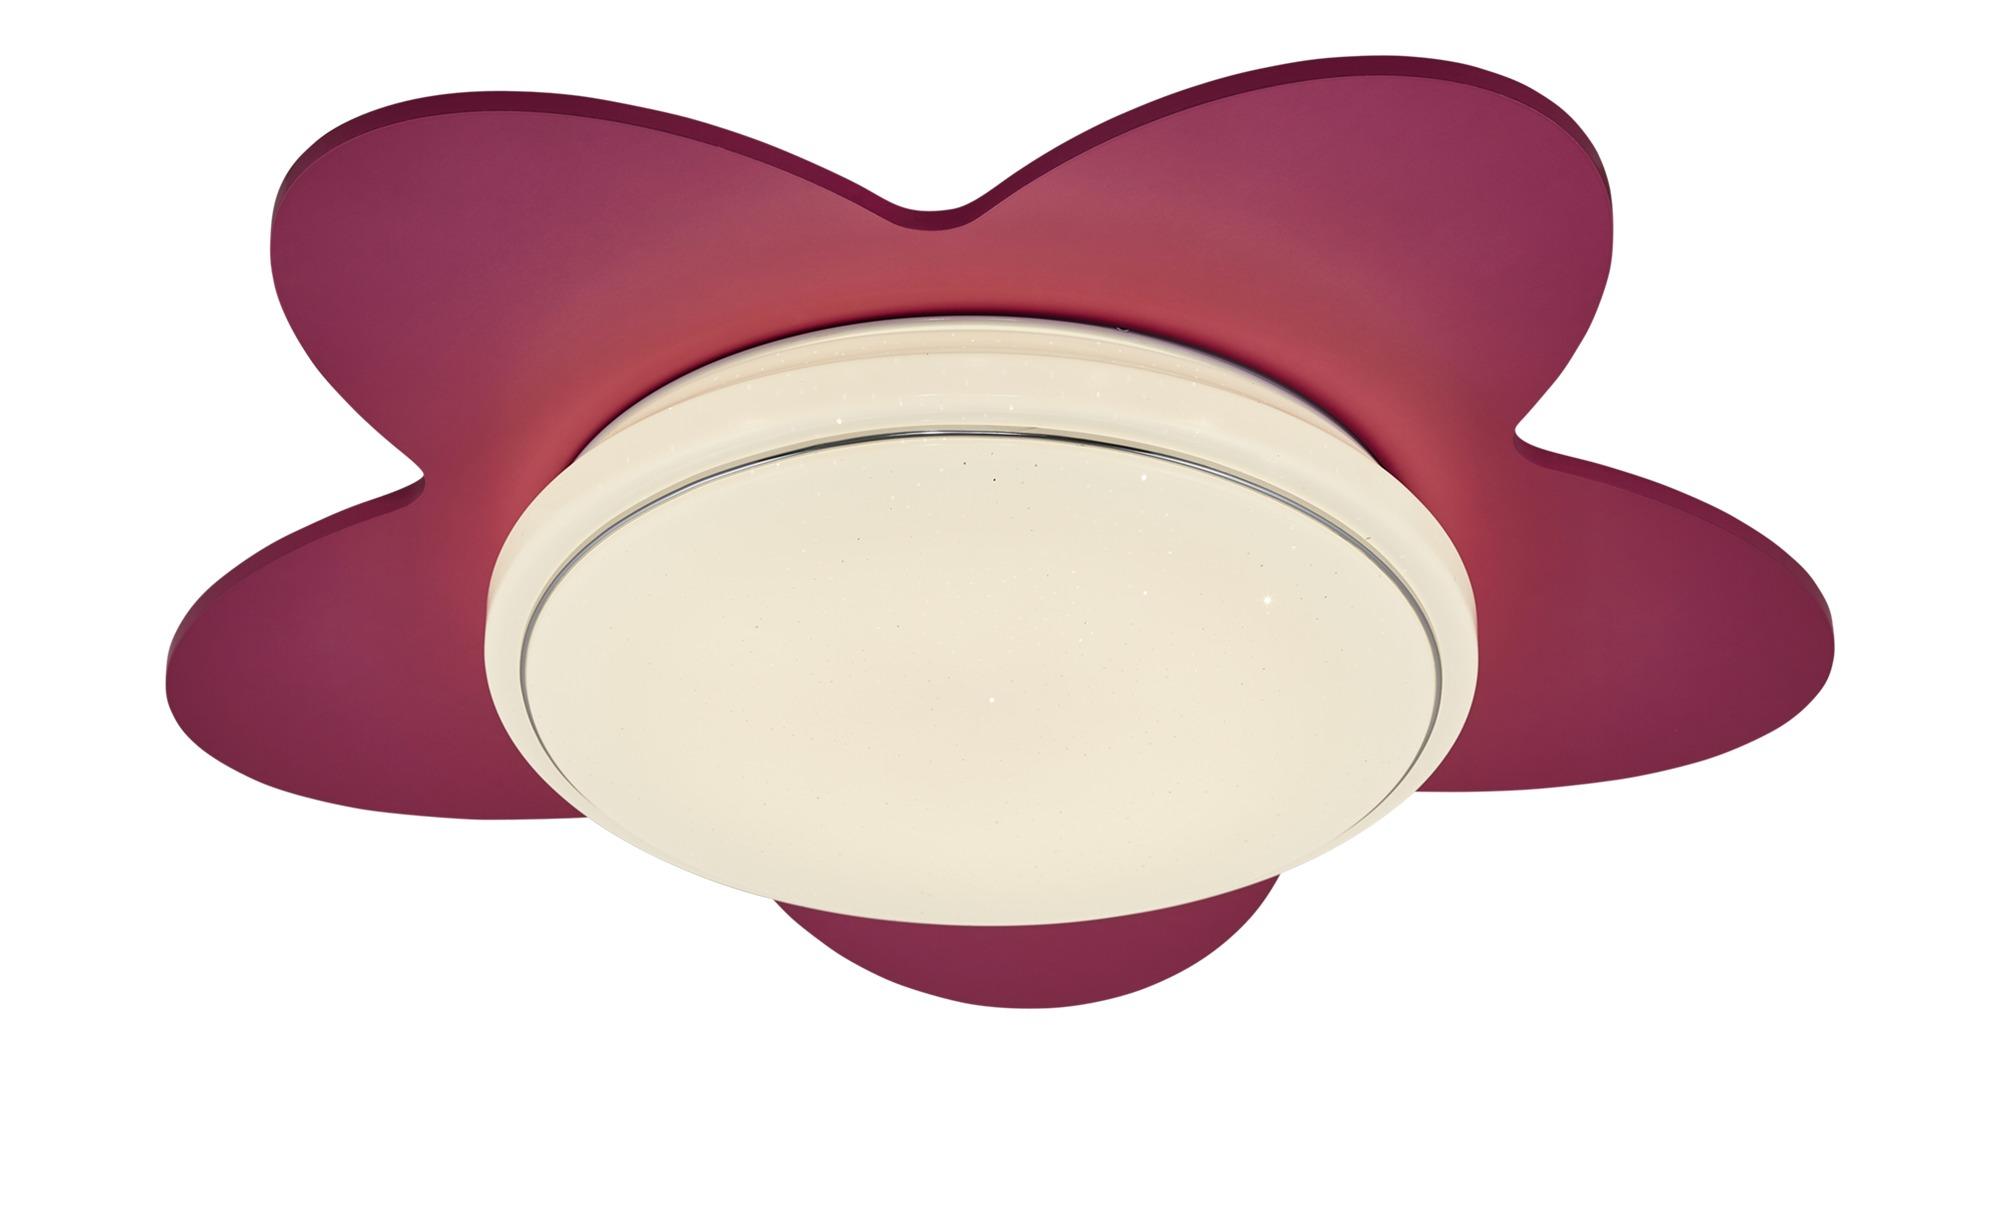 LED-Deckenleuchte `Blume´ ¦ rosa/pink ¦ Maße (cm): B: 50 T: 20 Lampen & Leuchten > Innenleuchten > Deckenleuchten - Höffner